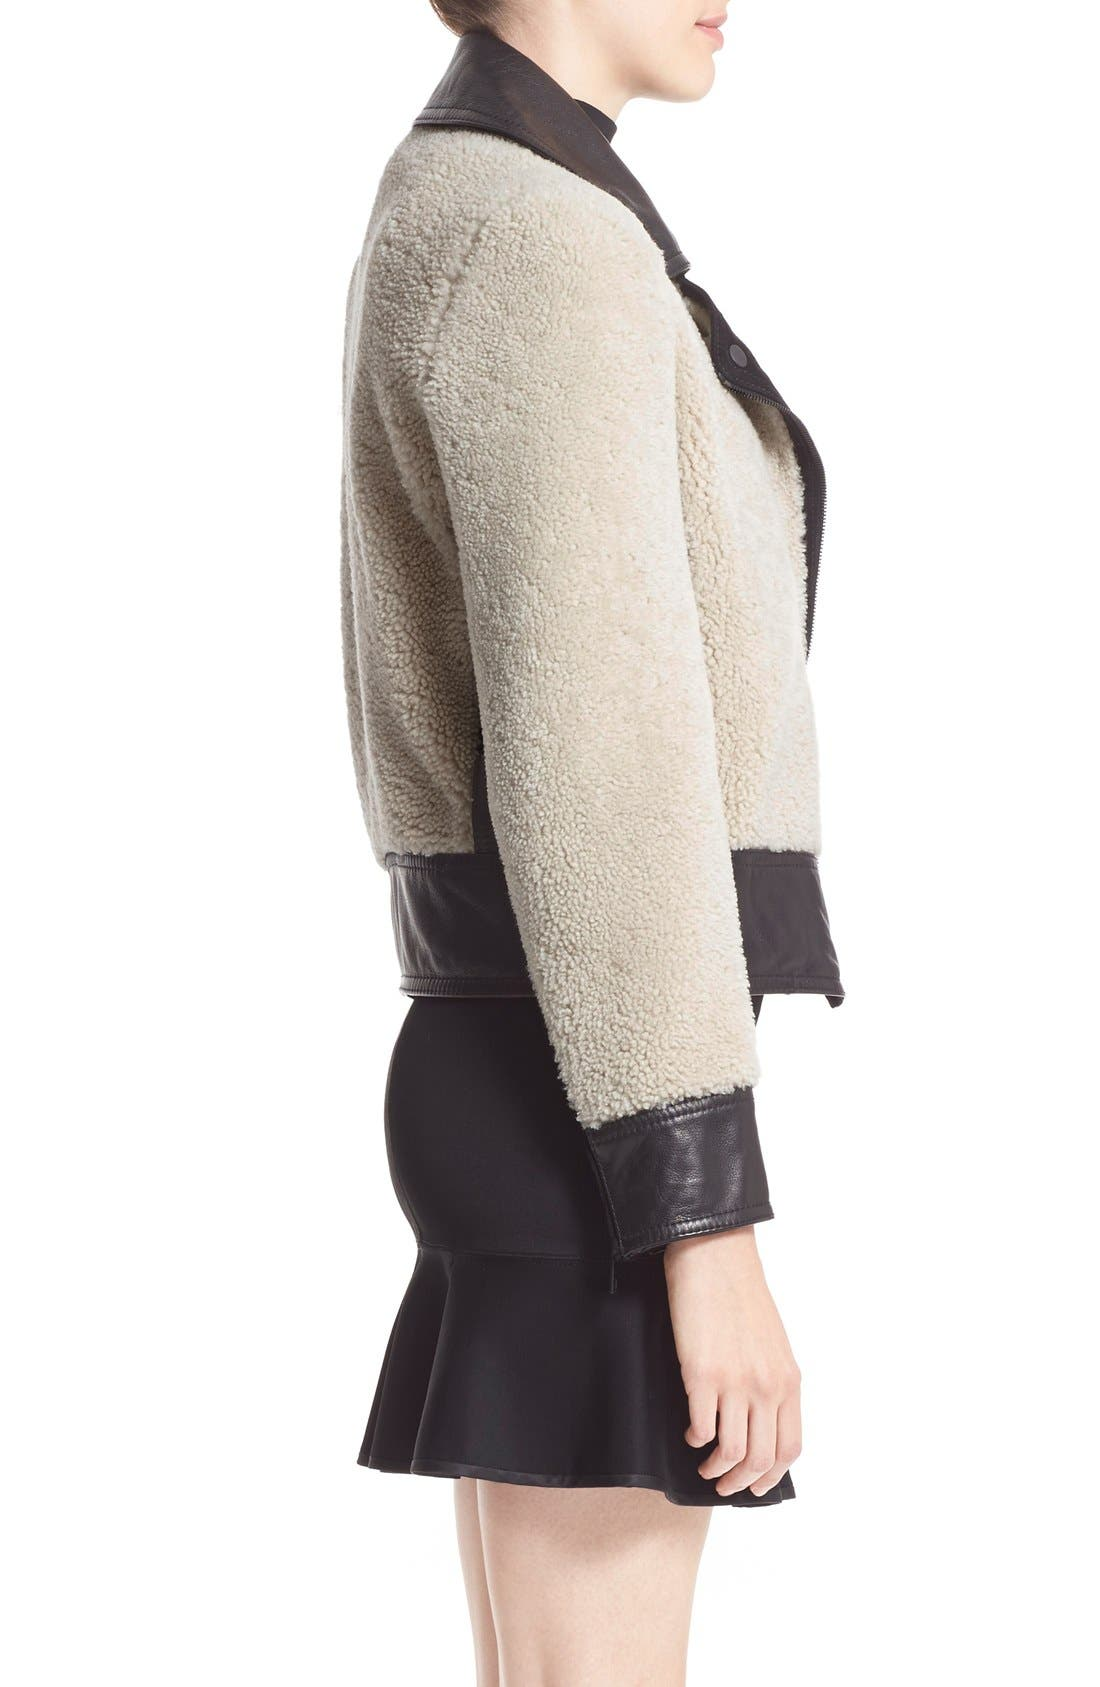 Alternate Image 3  - rag & bone 'Billie' Leather TrimGenuine Shearling Jacket